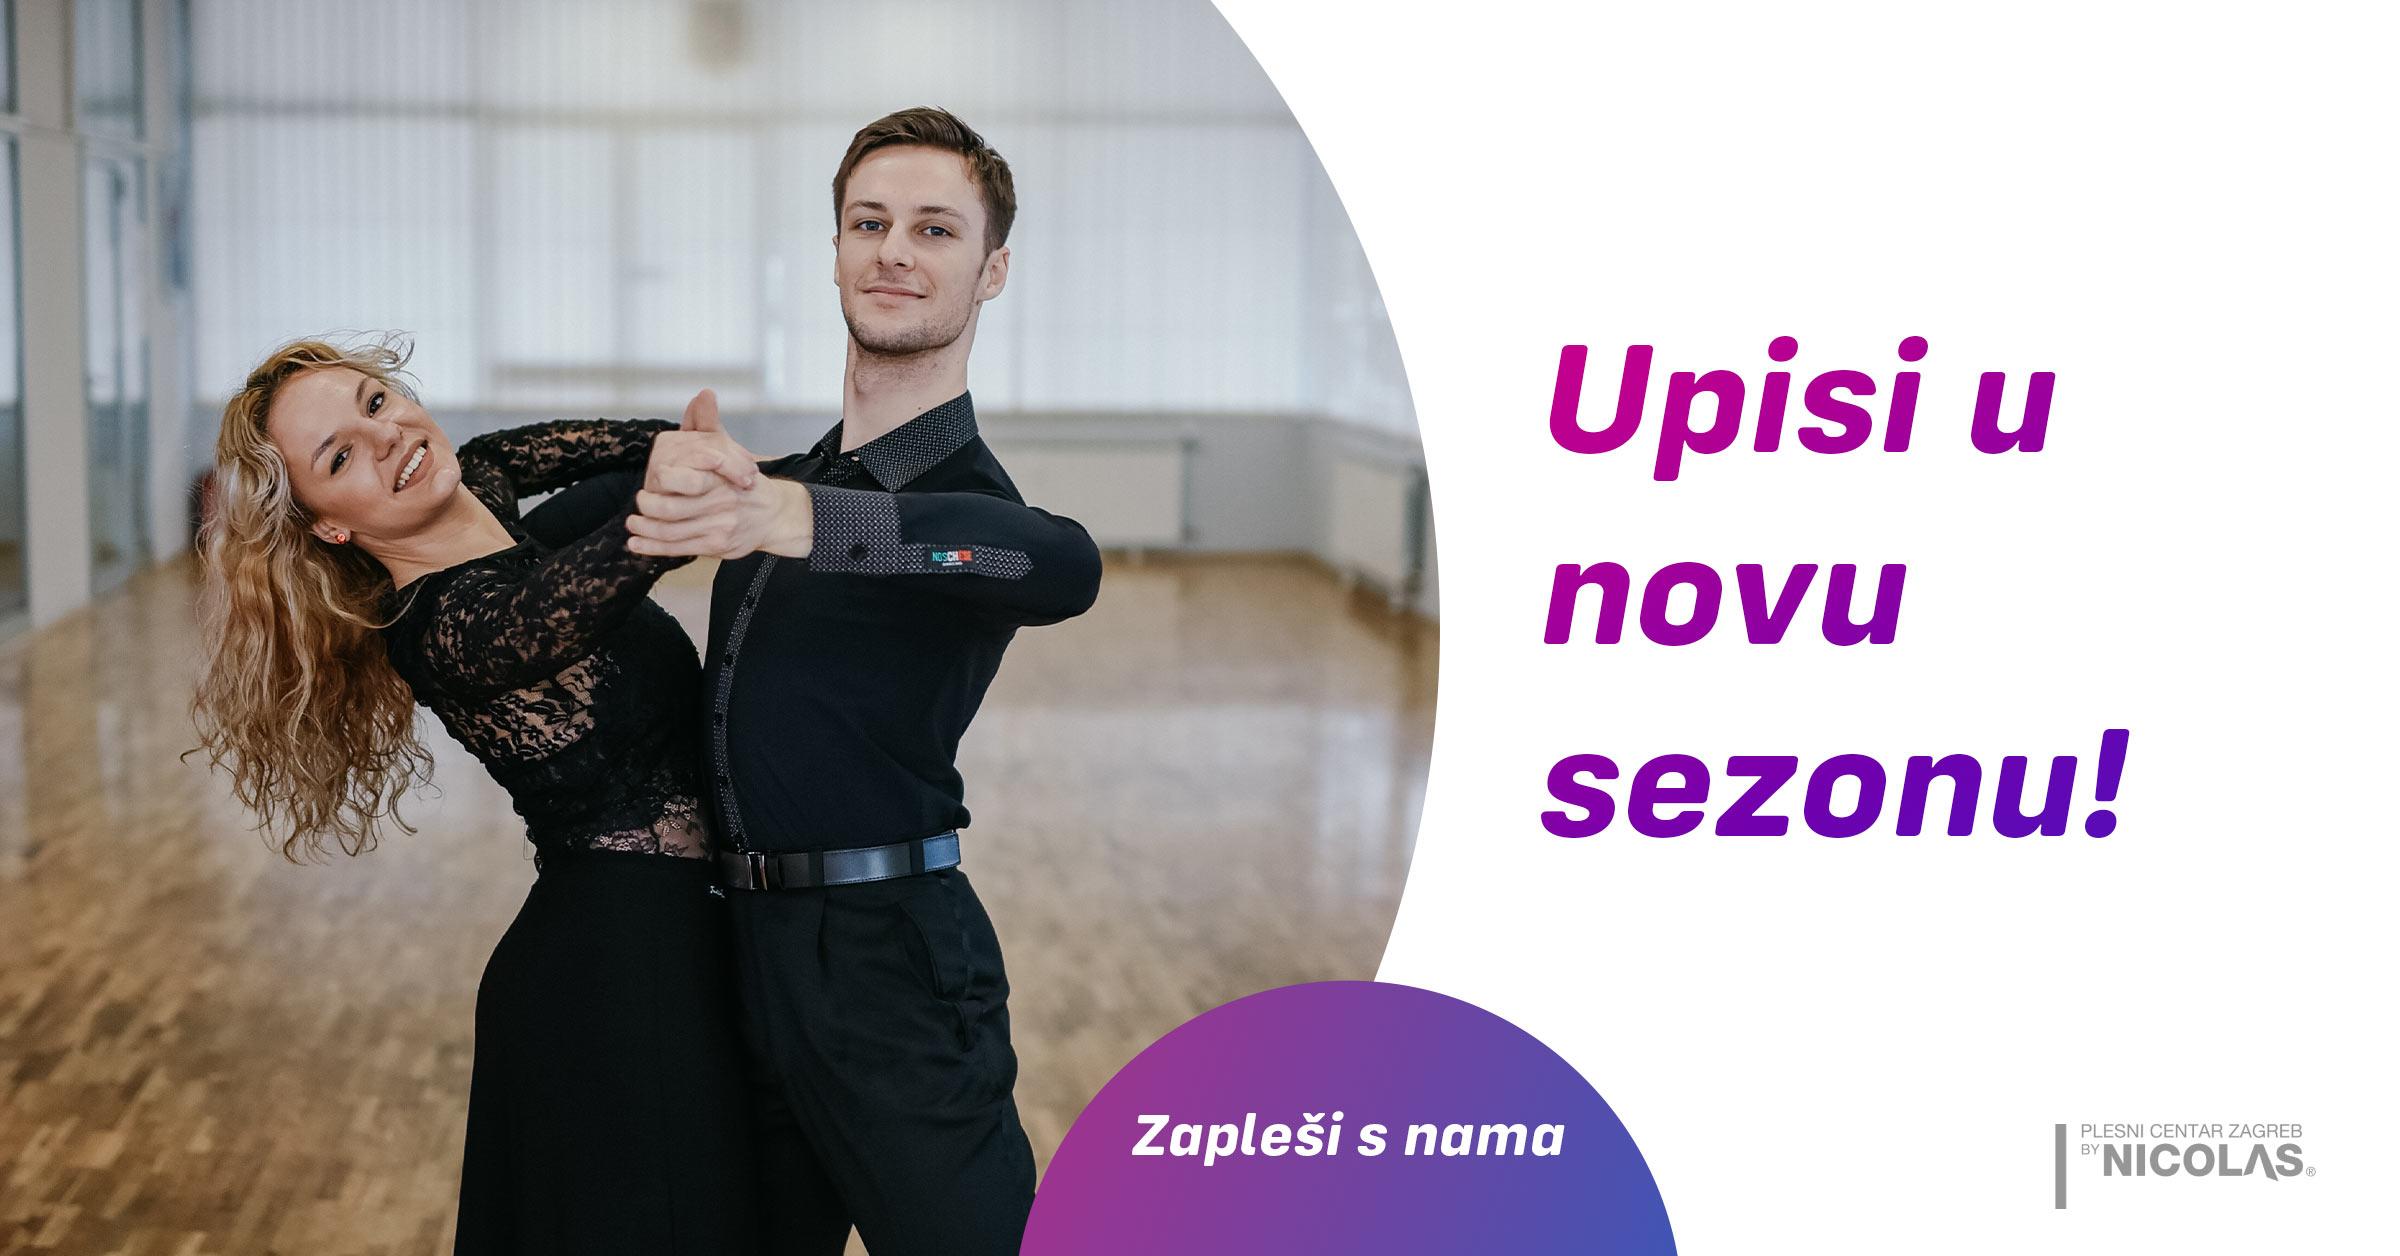 Plesni centar Zageb by Nicolas - Upisi u novu sezonu